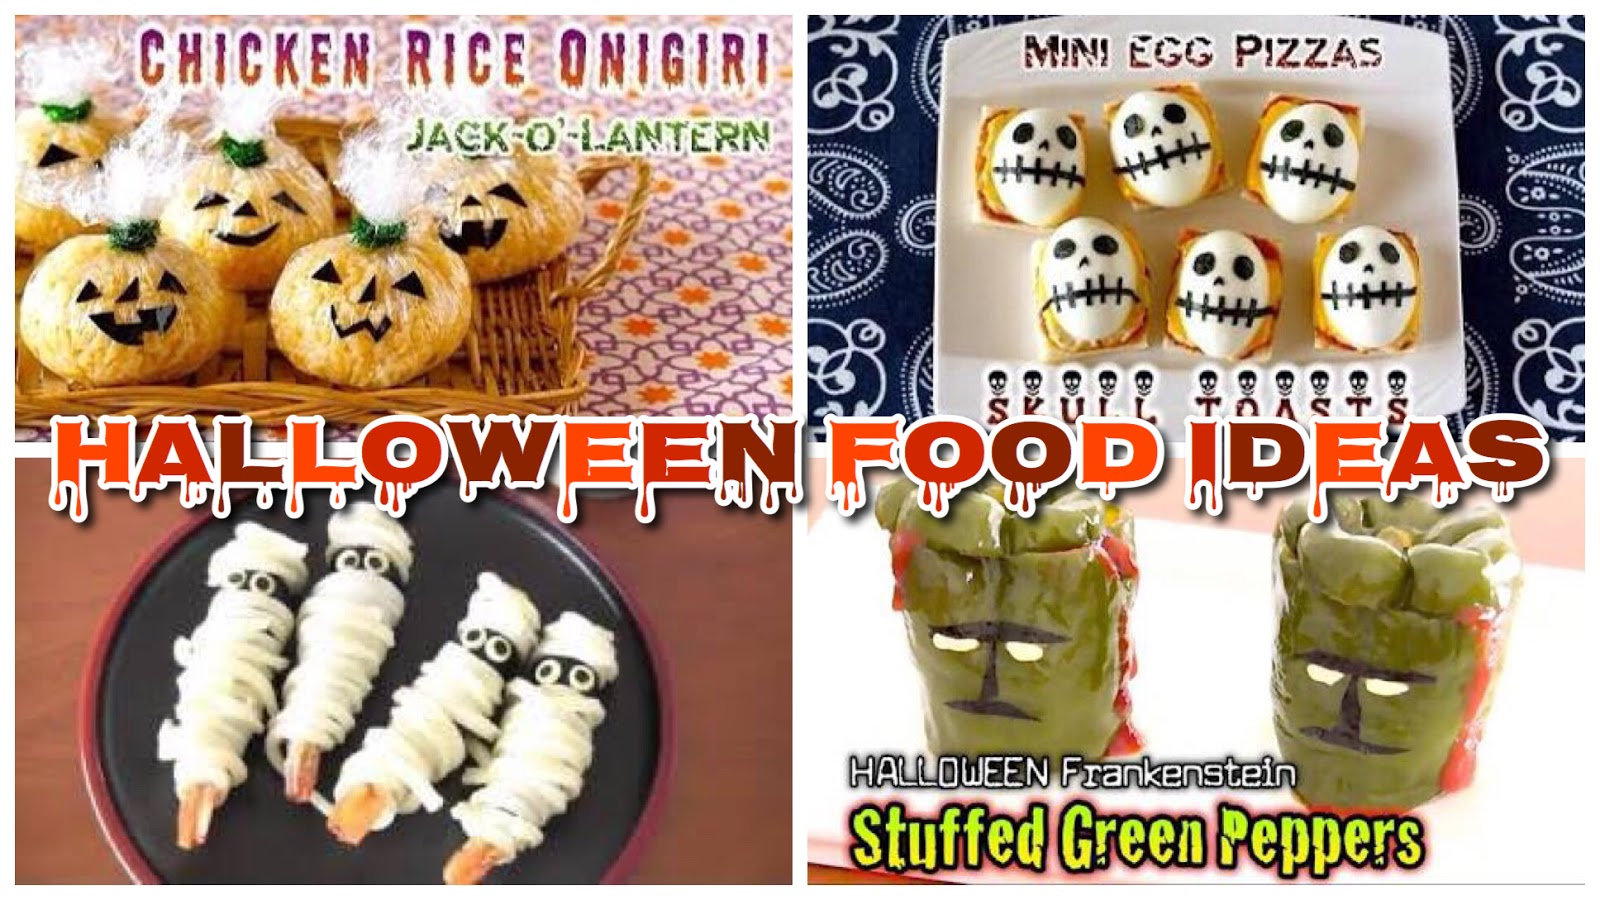 11 halloween party food ideas (cute and easy recipes) | ochikeron